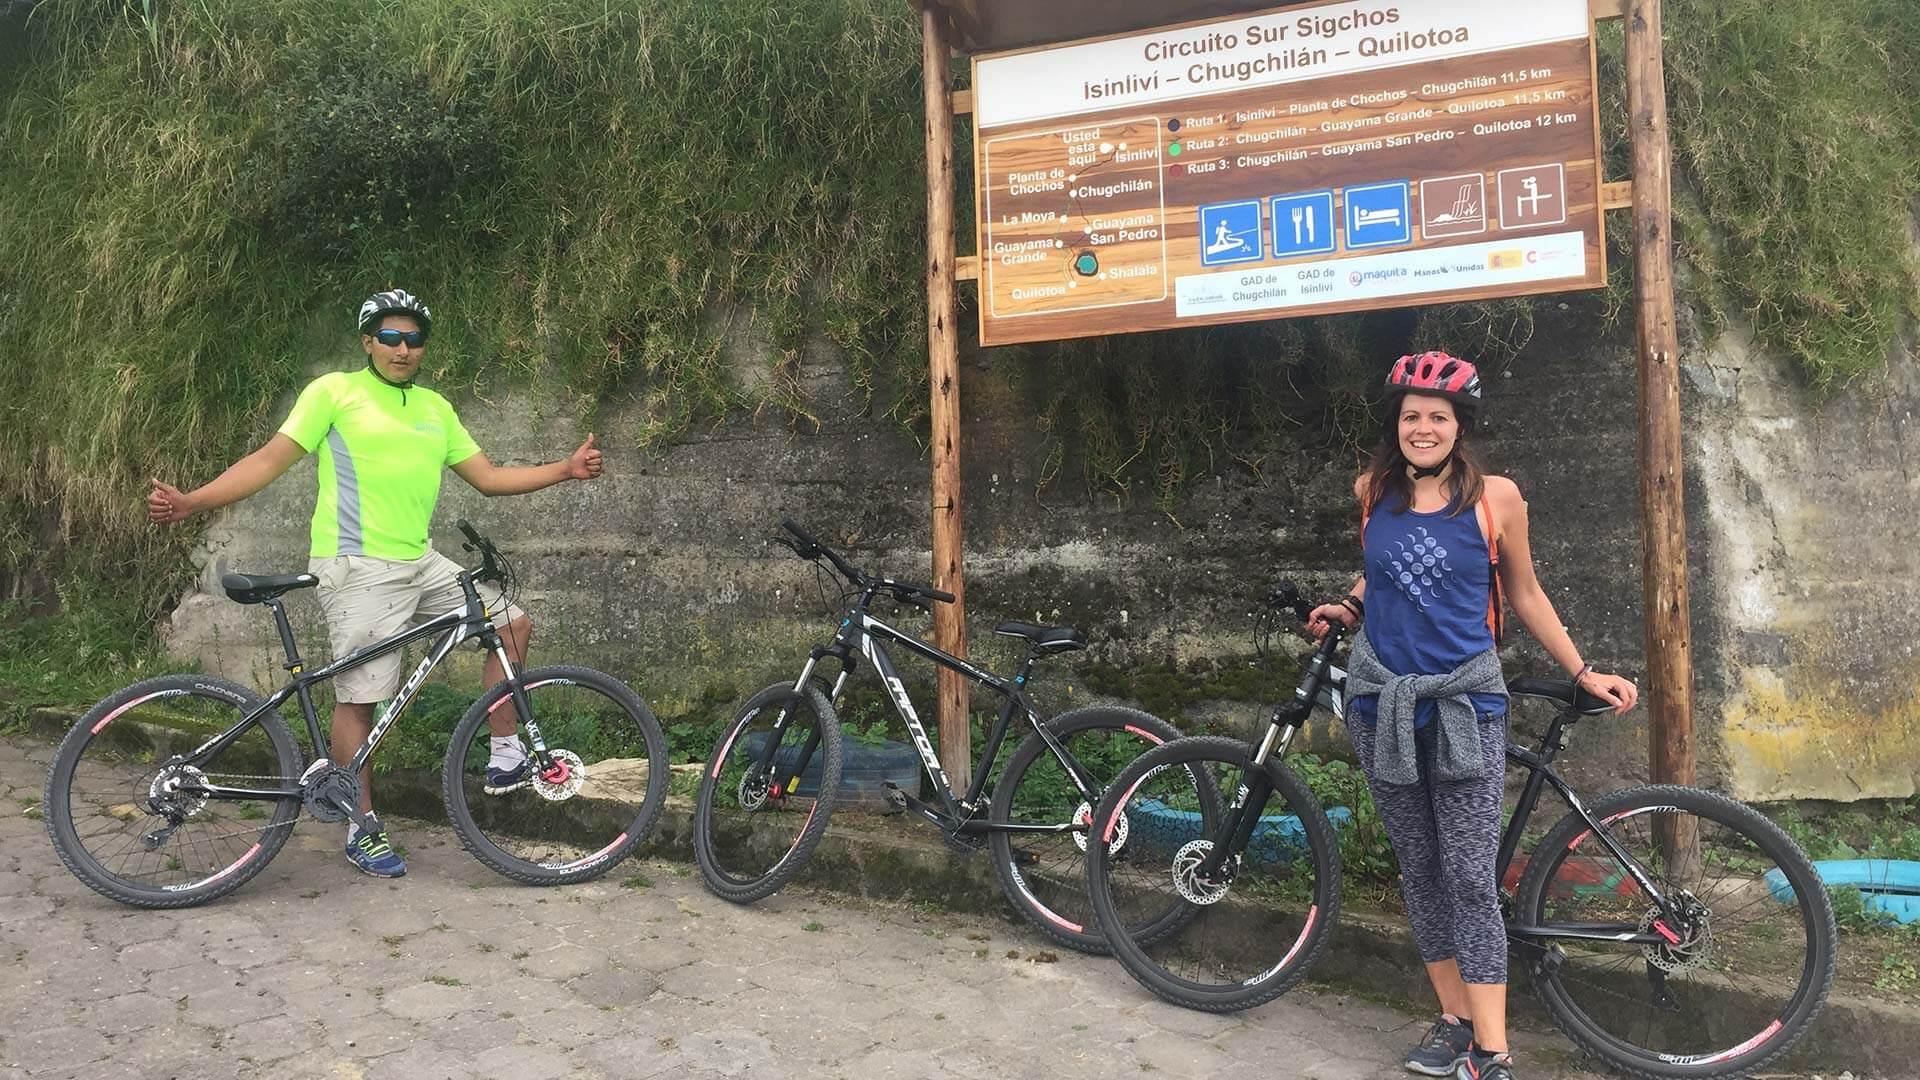 Circuito Quilotoa : Day trips llullu llama